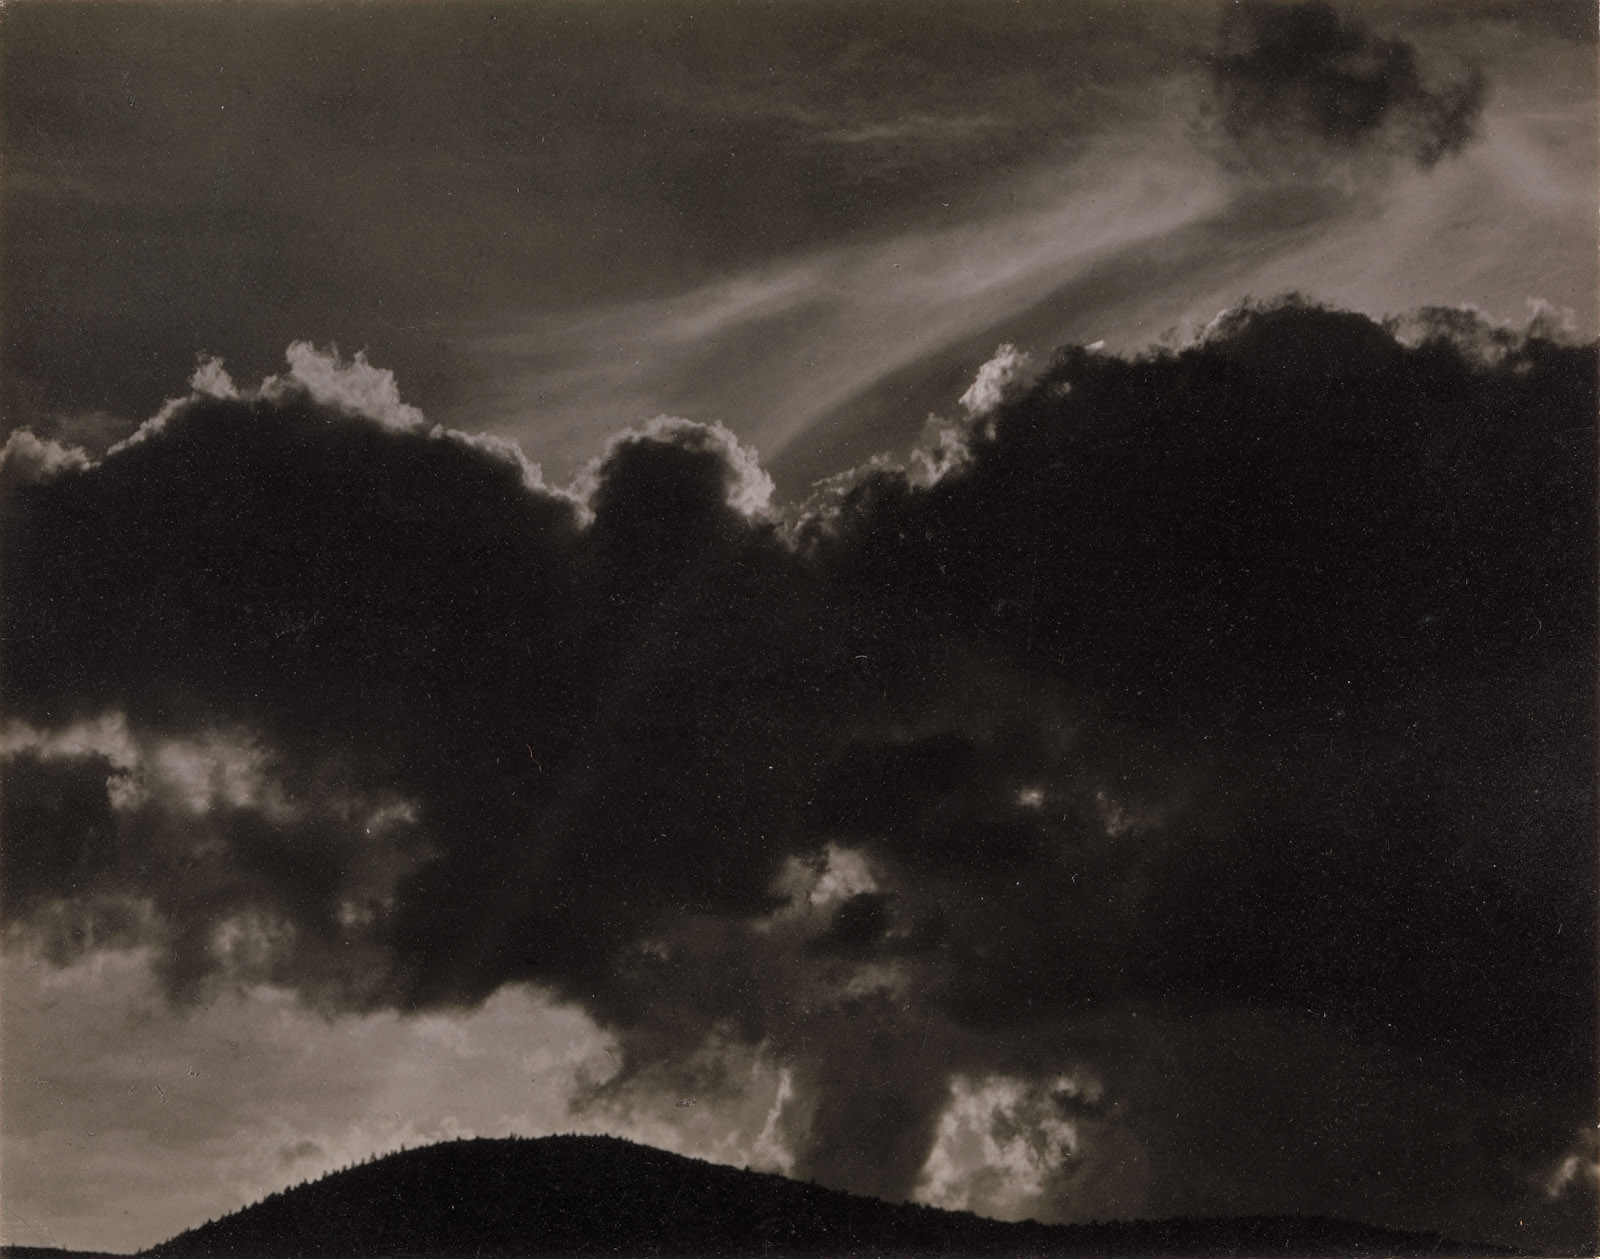 Alfred Stieglitz: Songs of the Sky, 1924